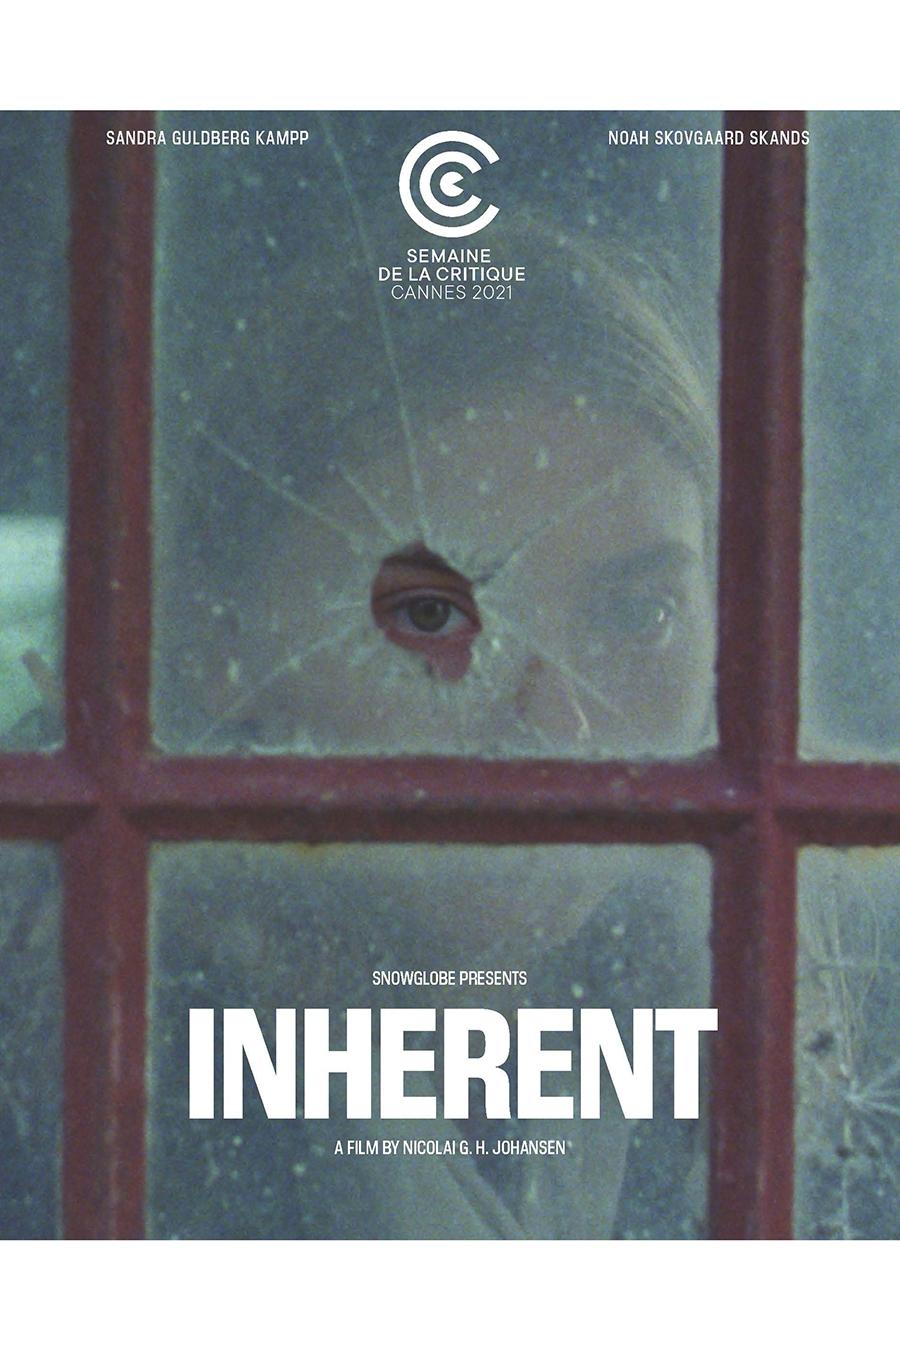 Inherent film poster